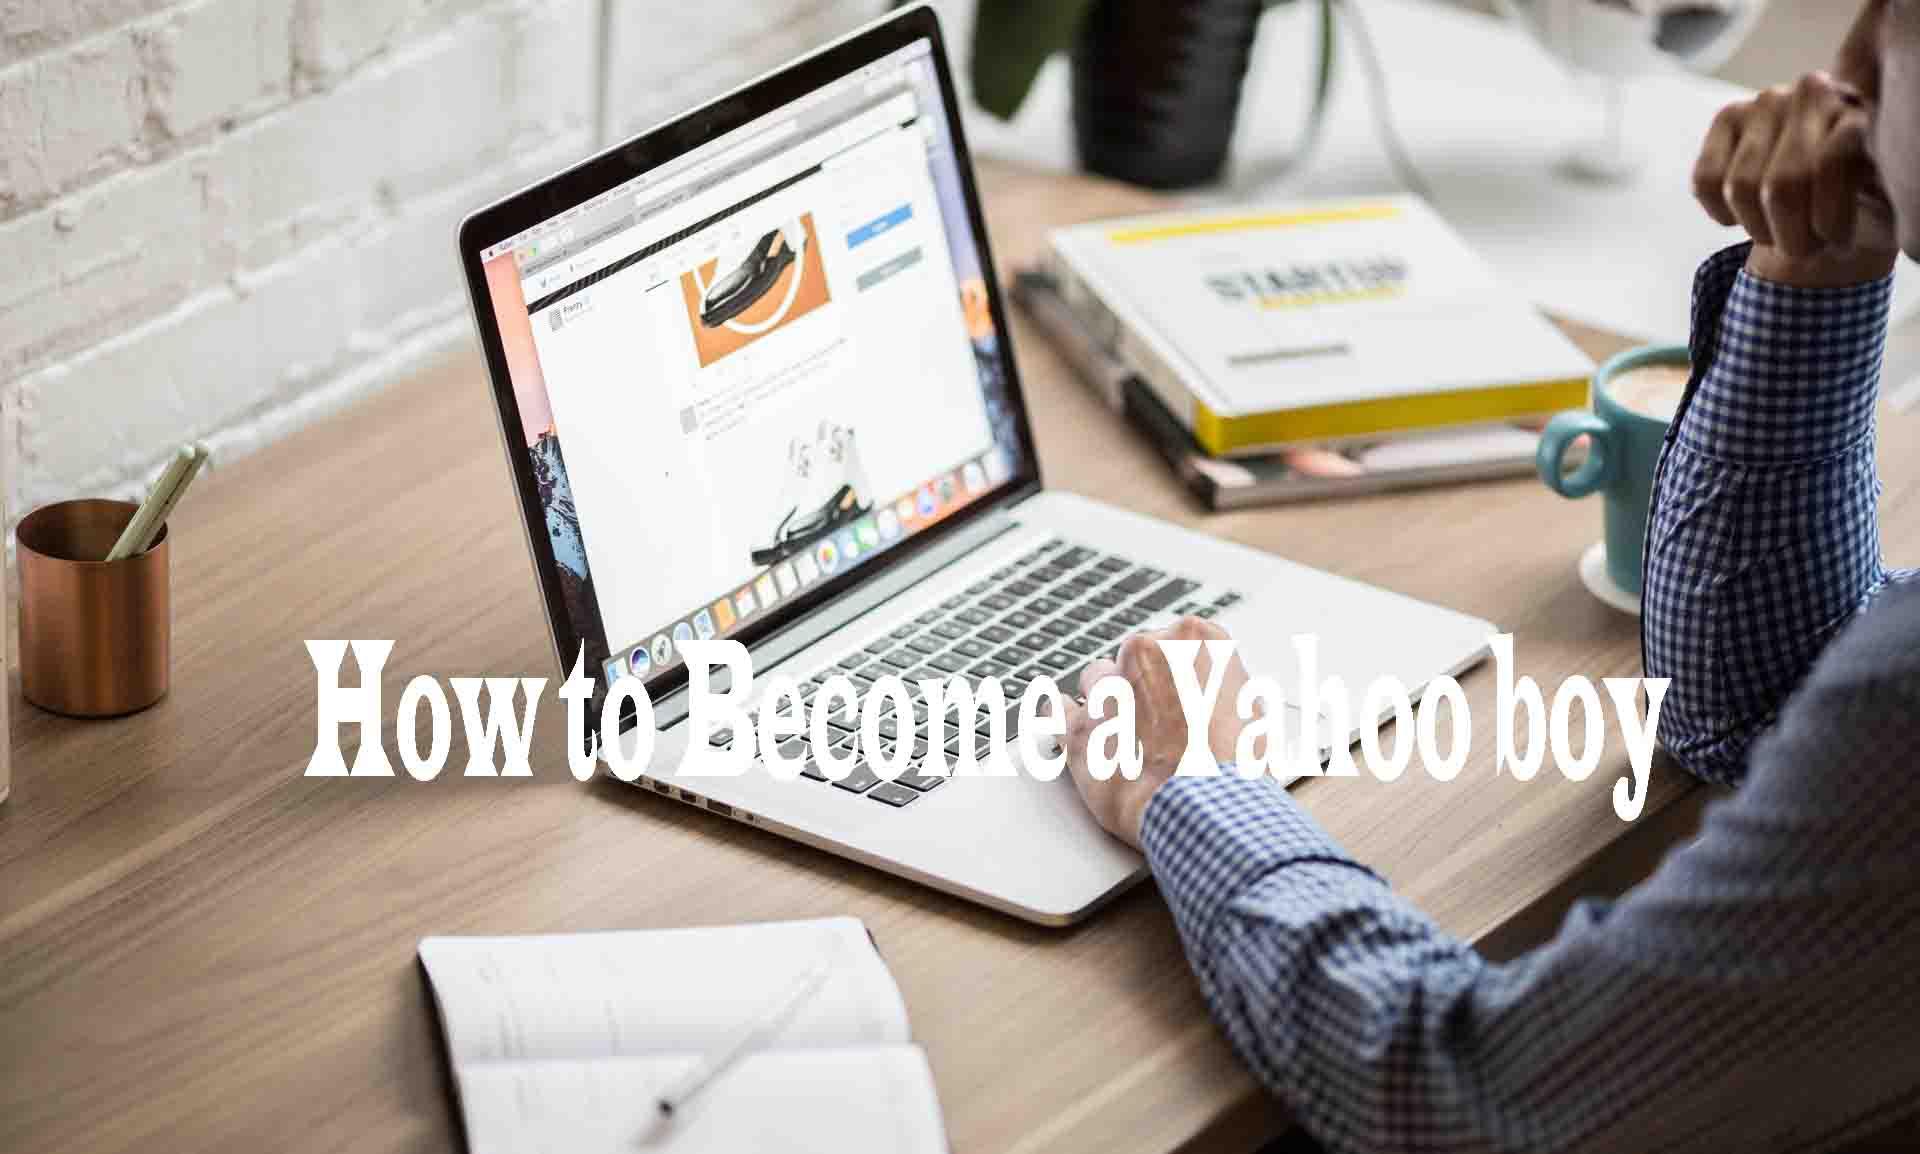 Become a Successful Yahoo Boy